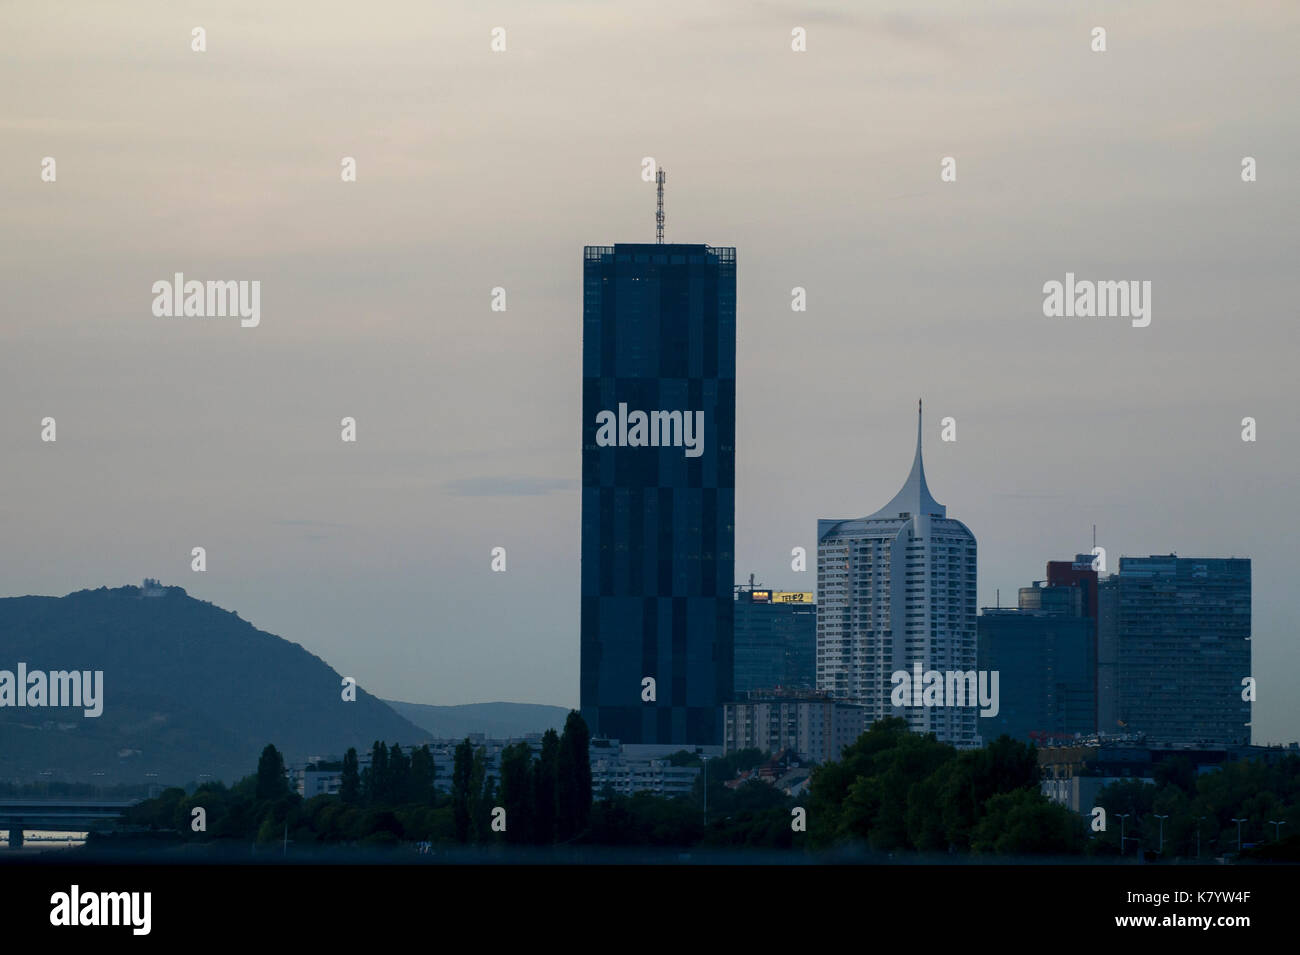 220 meter DC Tower 1 and 150 meter Hochhaus Neue Donau in Donau City of Wien, Austria. 24 August 2017 © Wojciech Strozyk / Alamy Stock Photo - Stock Image